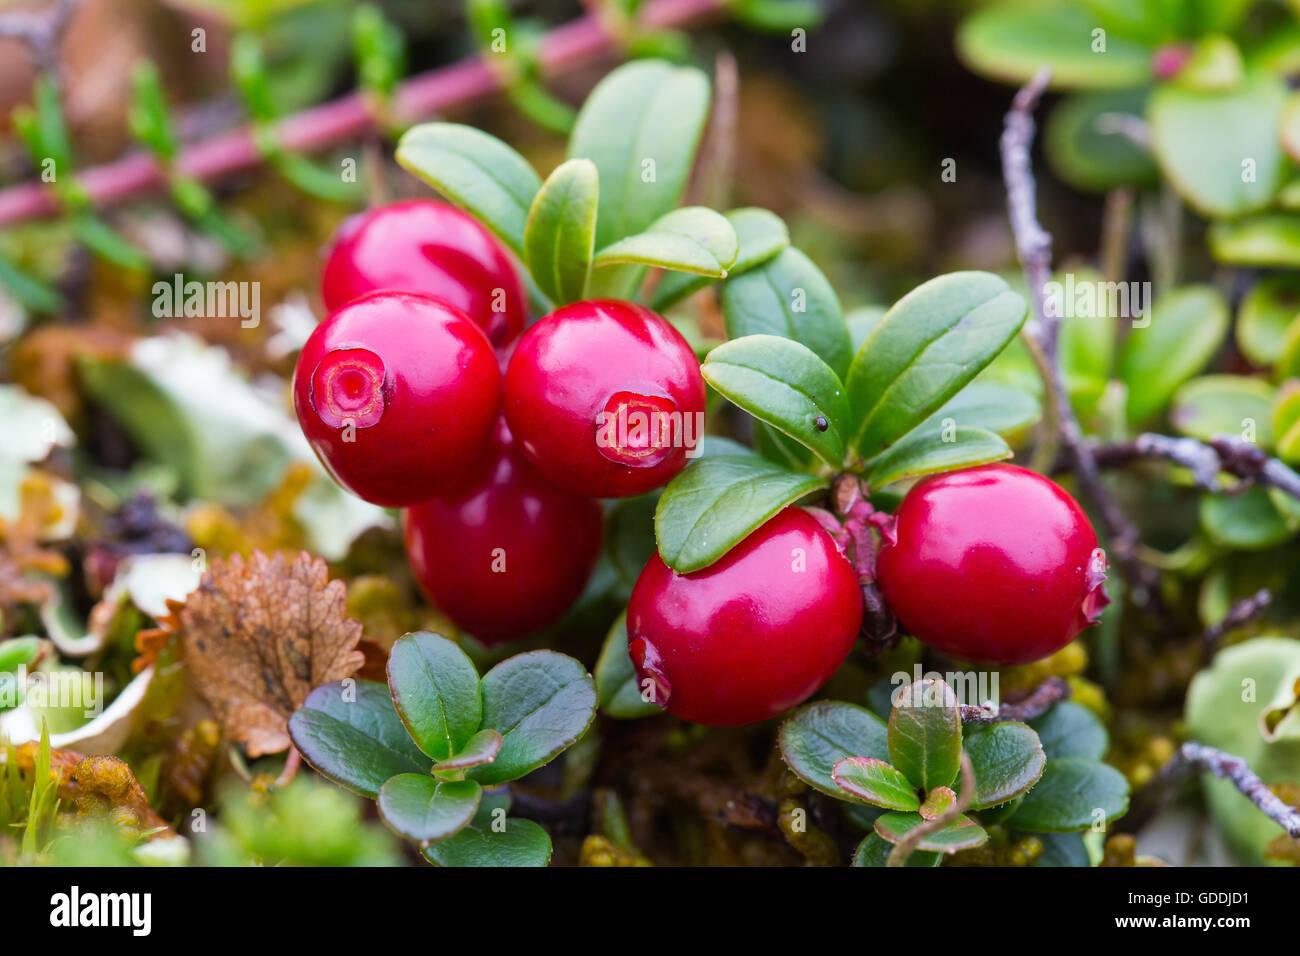 autumn berries europe colors lapland plants scandinavia. Black Bedroom Furniture Sets. Home Design Ideas